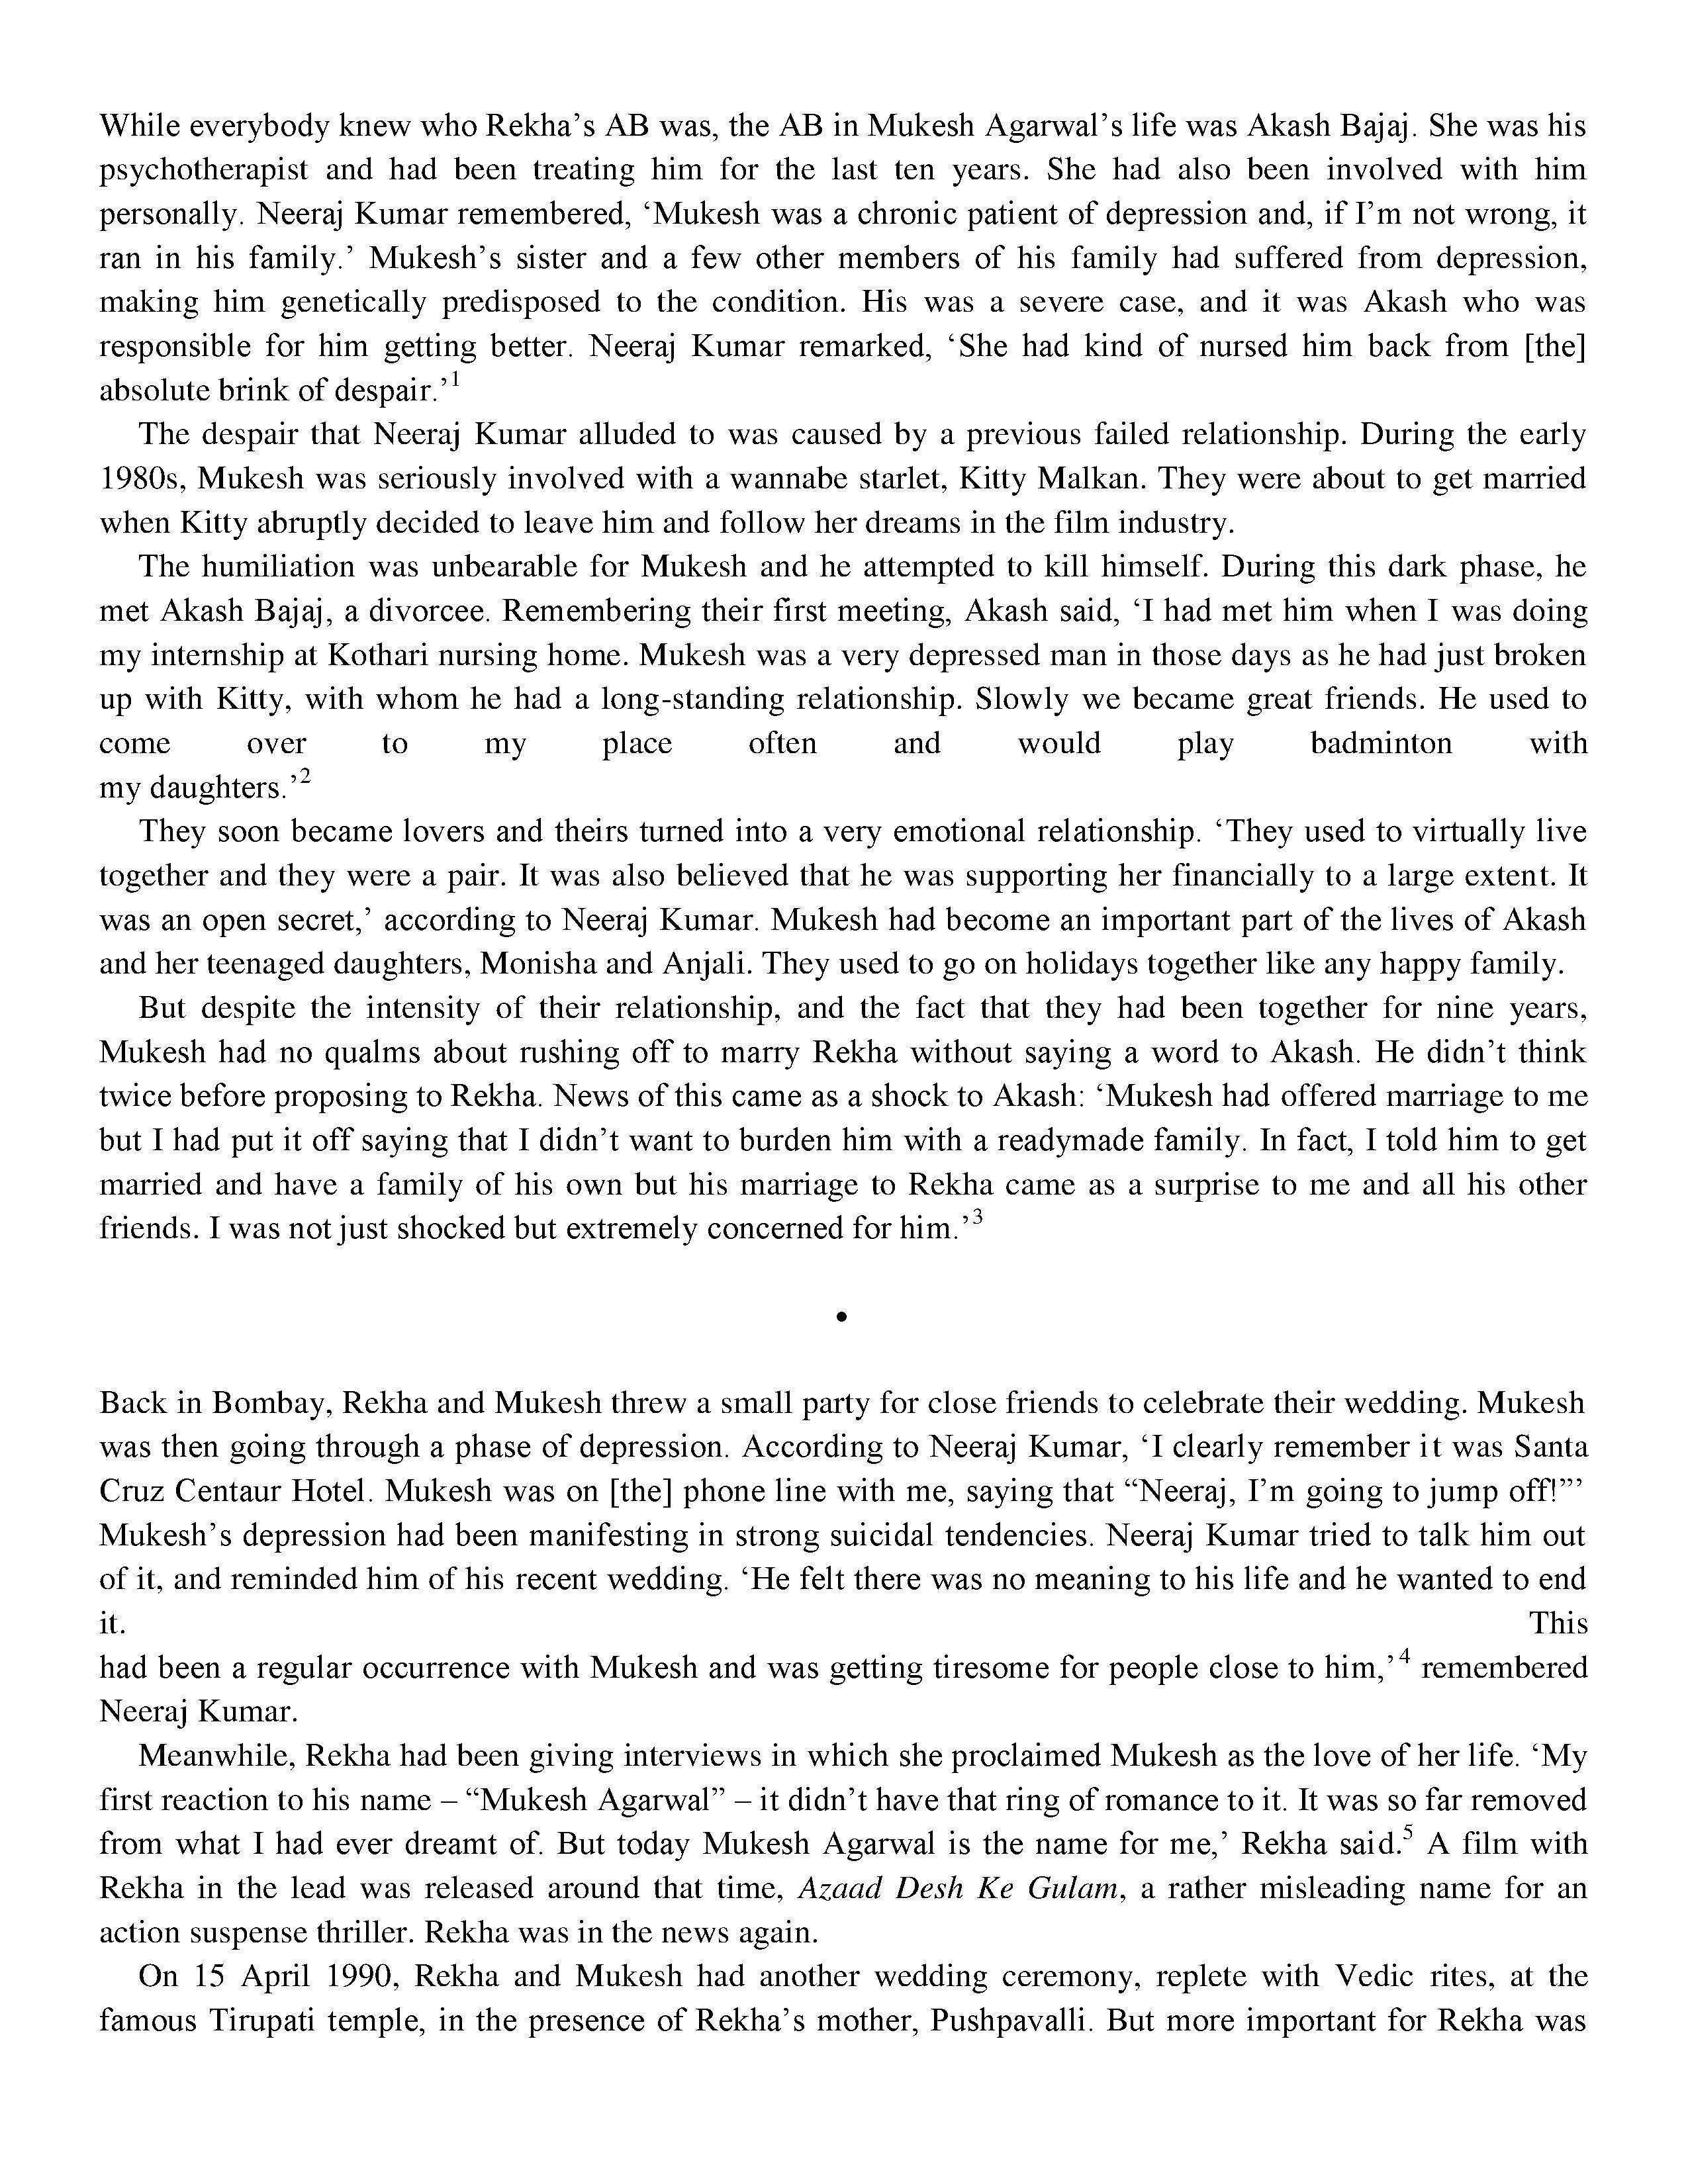 Rekha: The Untold Story By : Yasser Usman